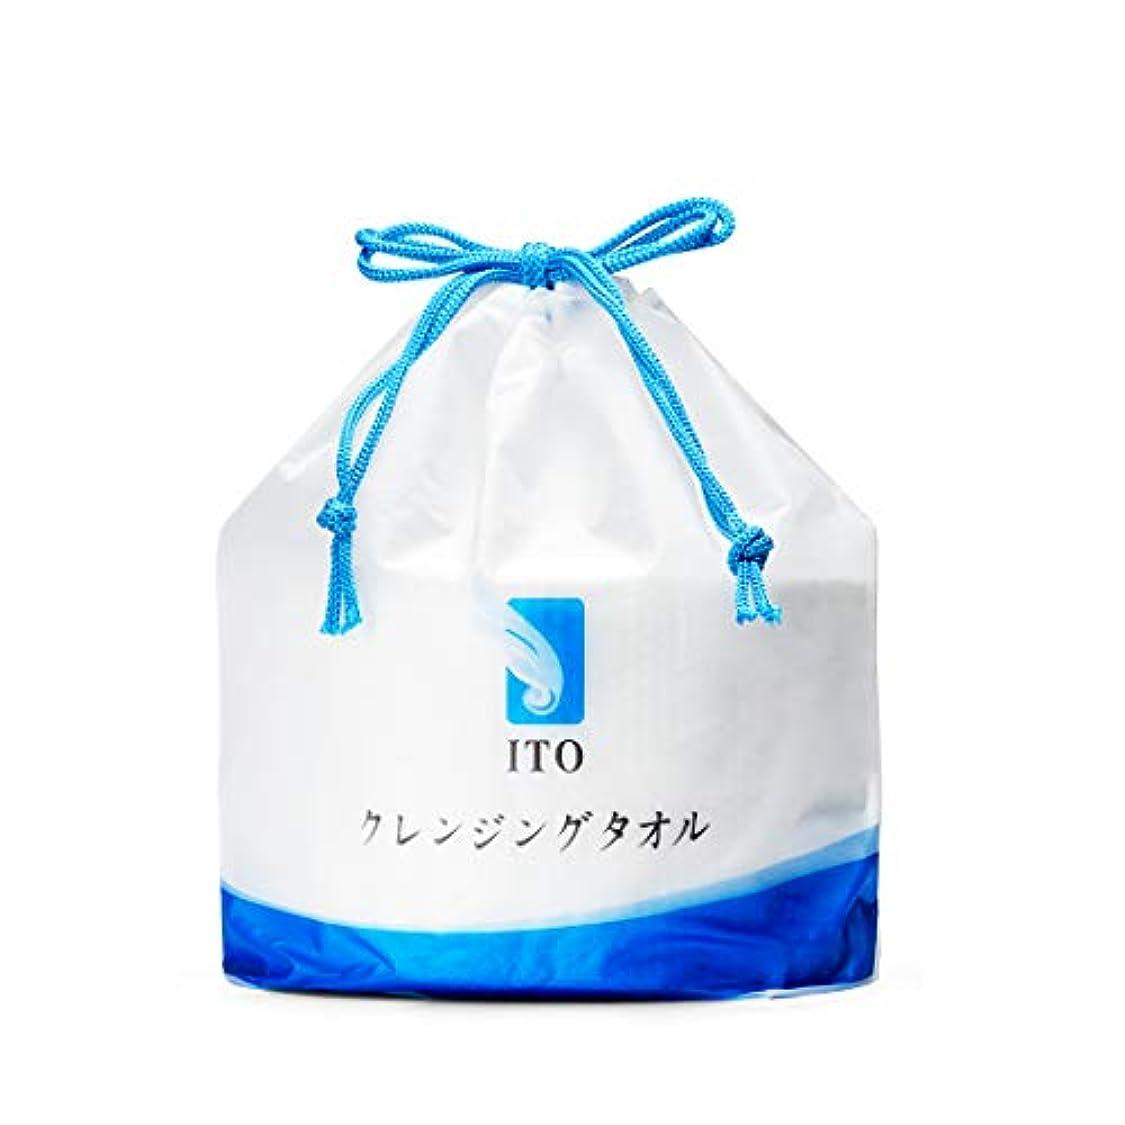 ITO クレンジングタオル 使い捨てタオル 洗顔タオル 乾湿両用 美容タオル フェイスタオル 旅行 メイク落とし (ホワイト)